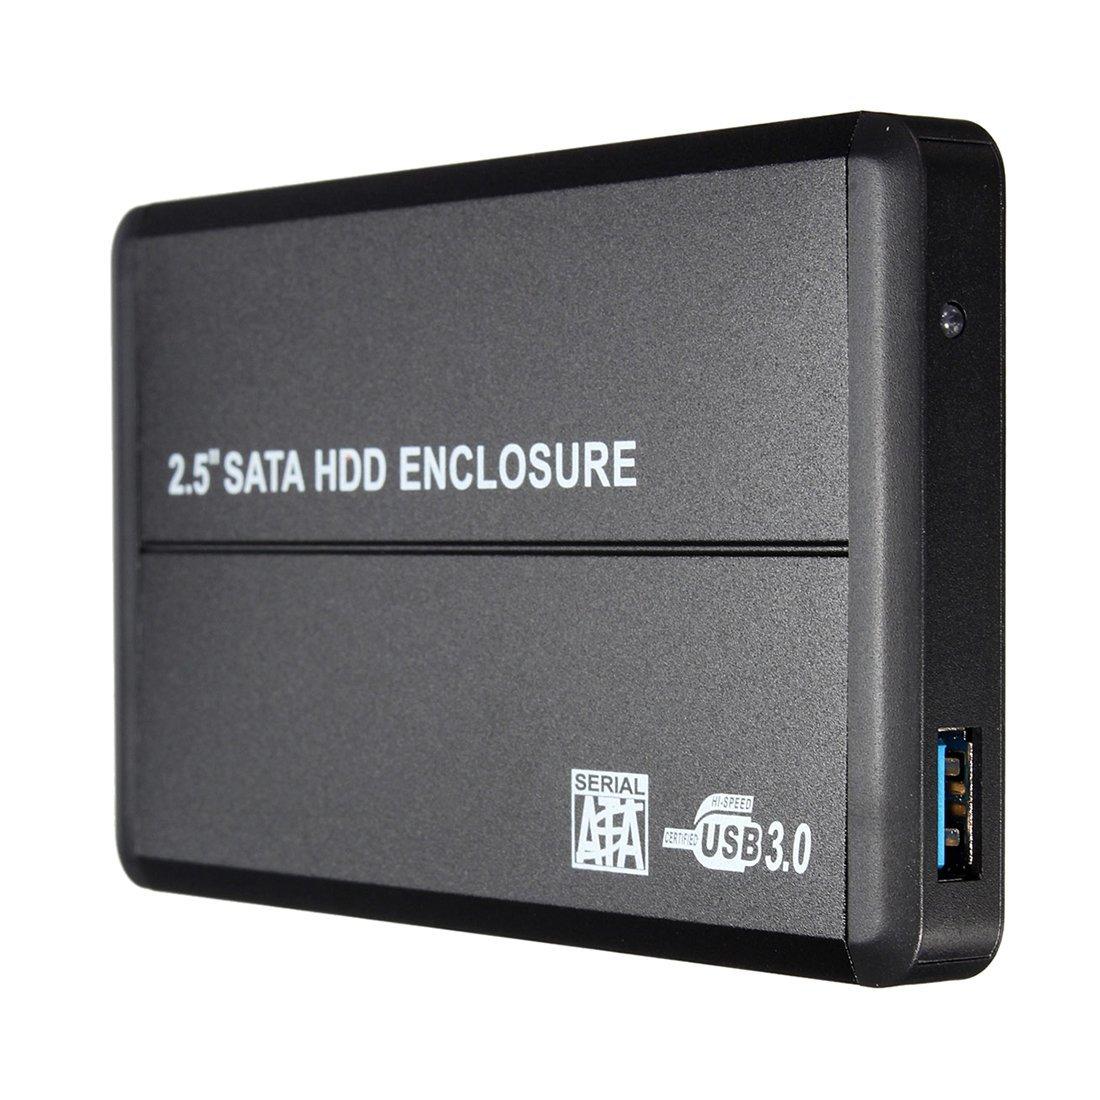 "2.5"" SATA HDD Enclosure Case - TOOGOO(R)USB 3.0 SATA 2.5"" Hard Disk Drive HDD External Enclosure Case Box For Laptop PC Black"